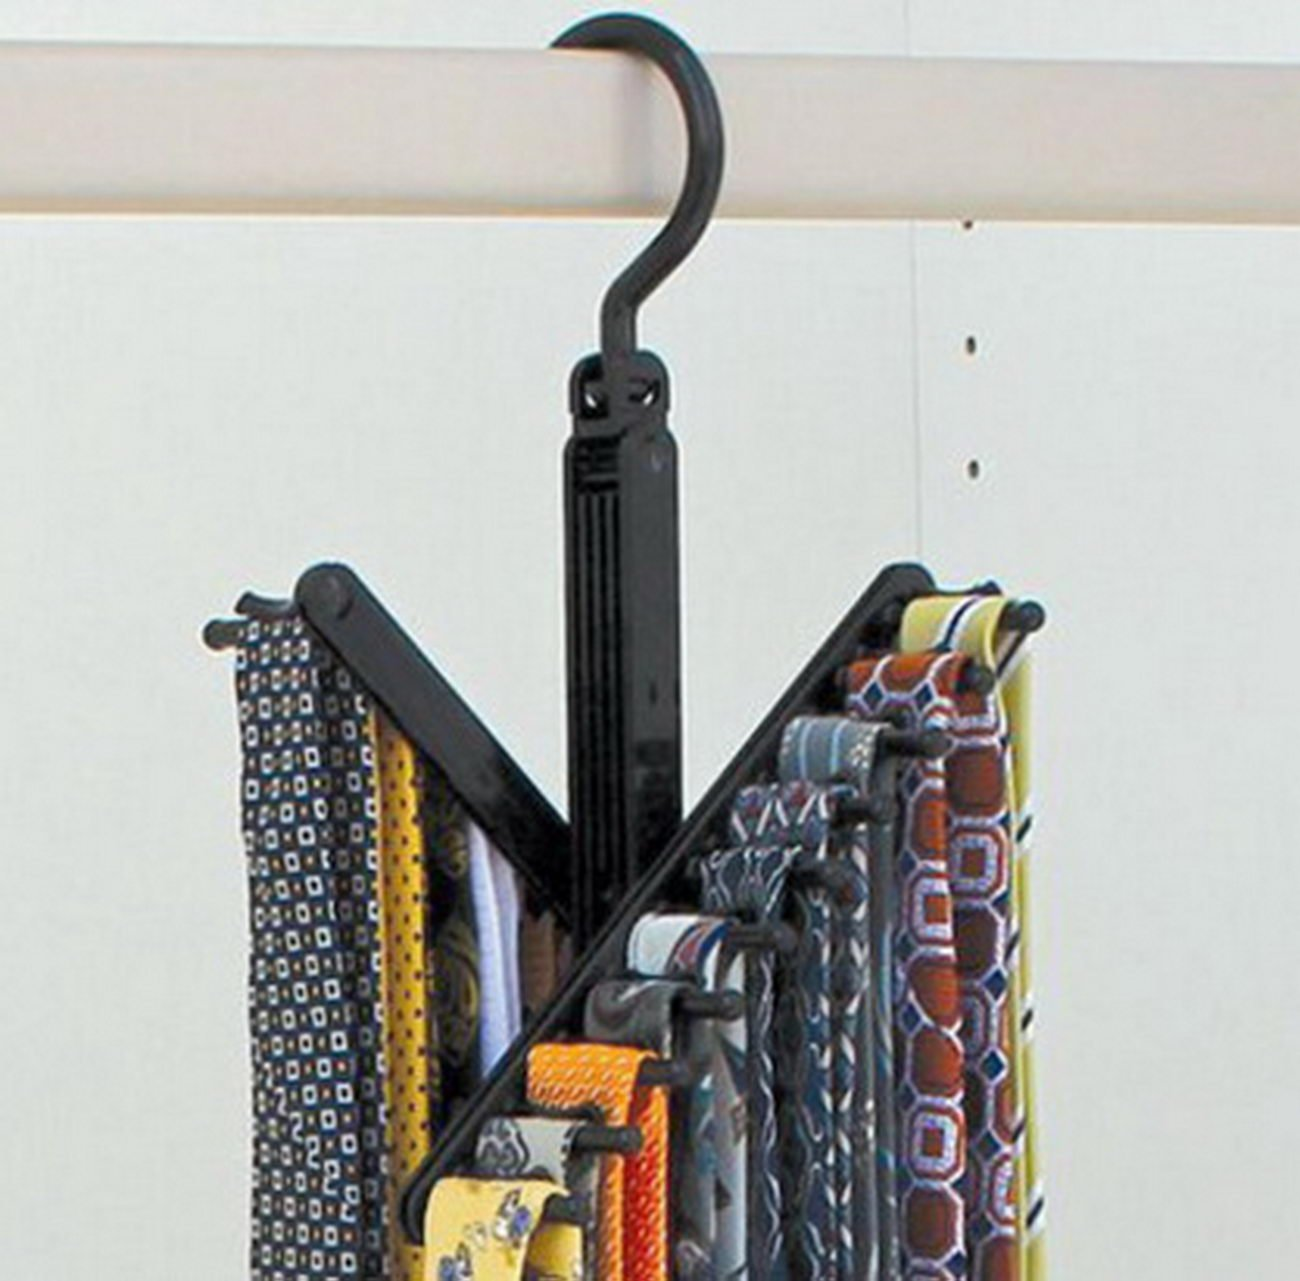 Cheap Tie Rack Walmart Find Tie Rack Walmart Deals On Line At